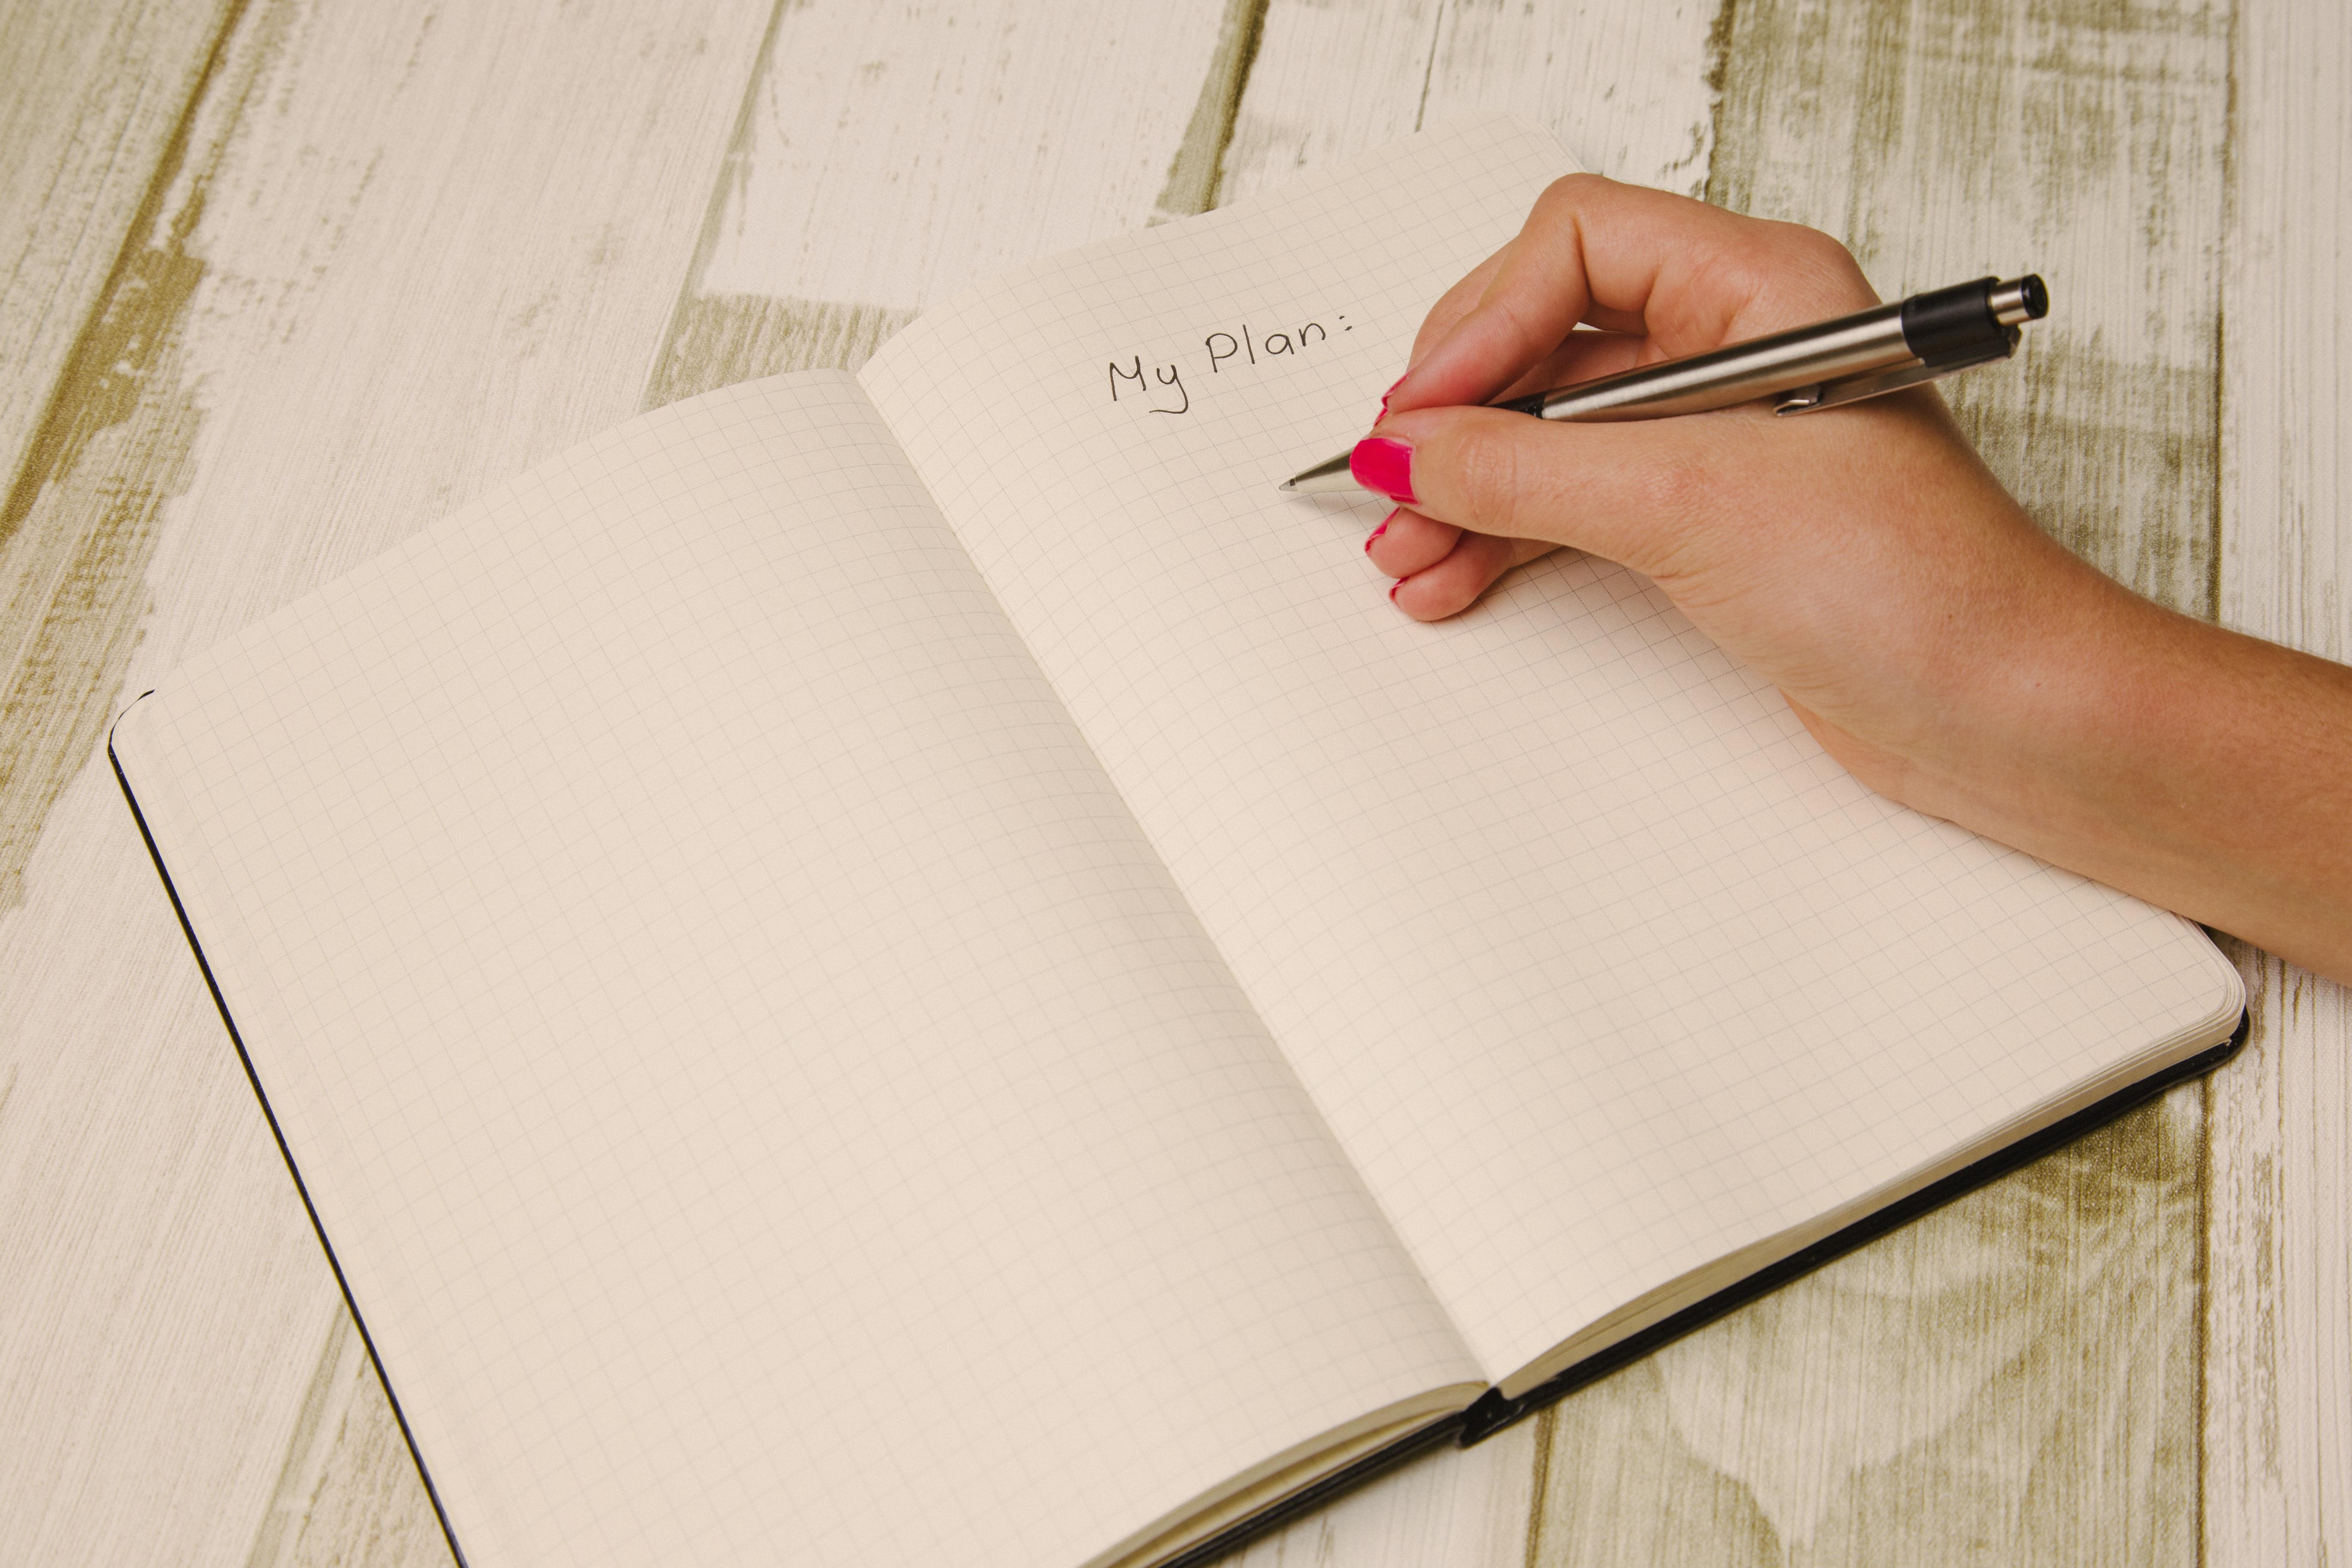 Desk Notebook Writing Hand Pen Organized Paper Arm Planner Write Brand Art  Sketch Drawing Design Planning  Design Paper For Writing